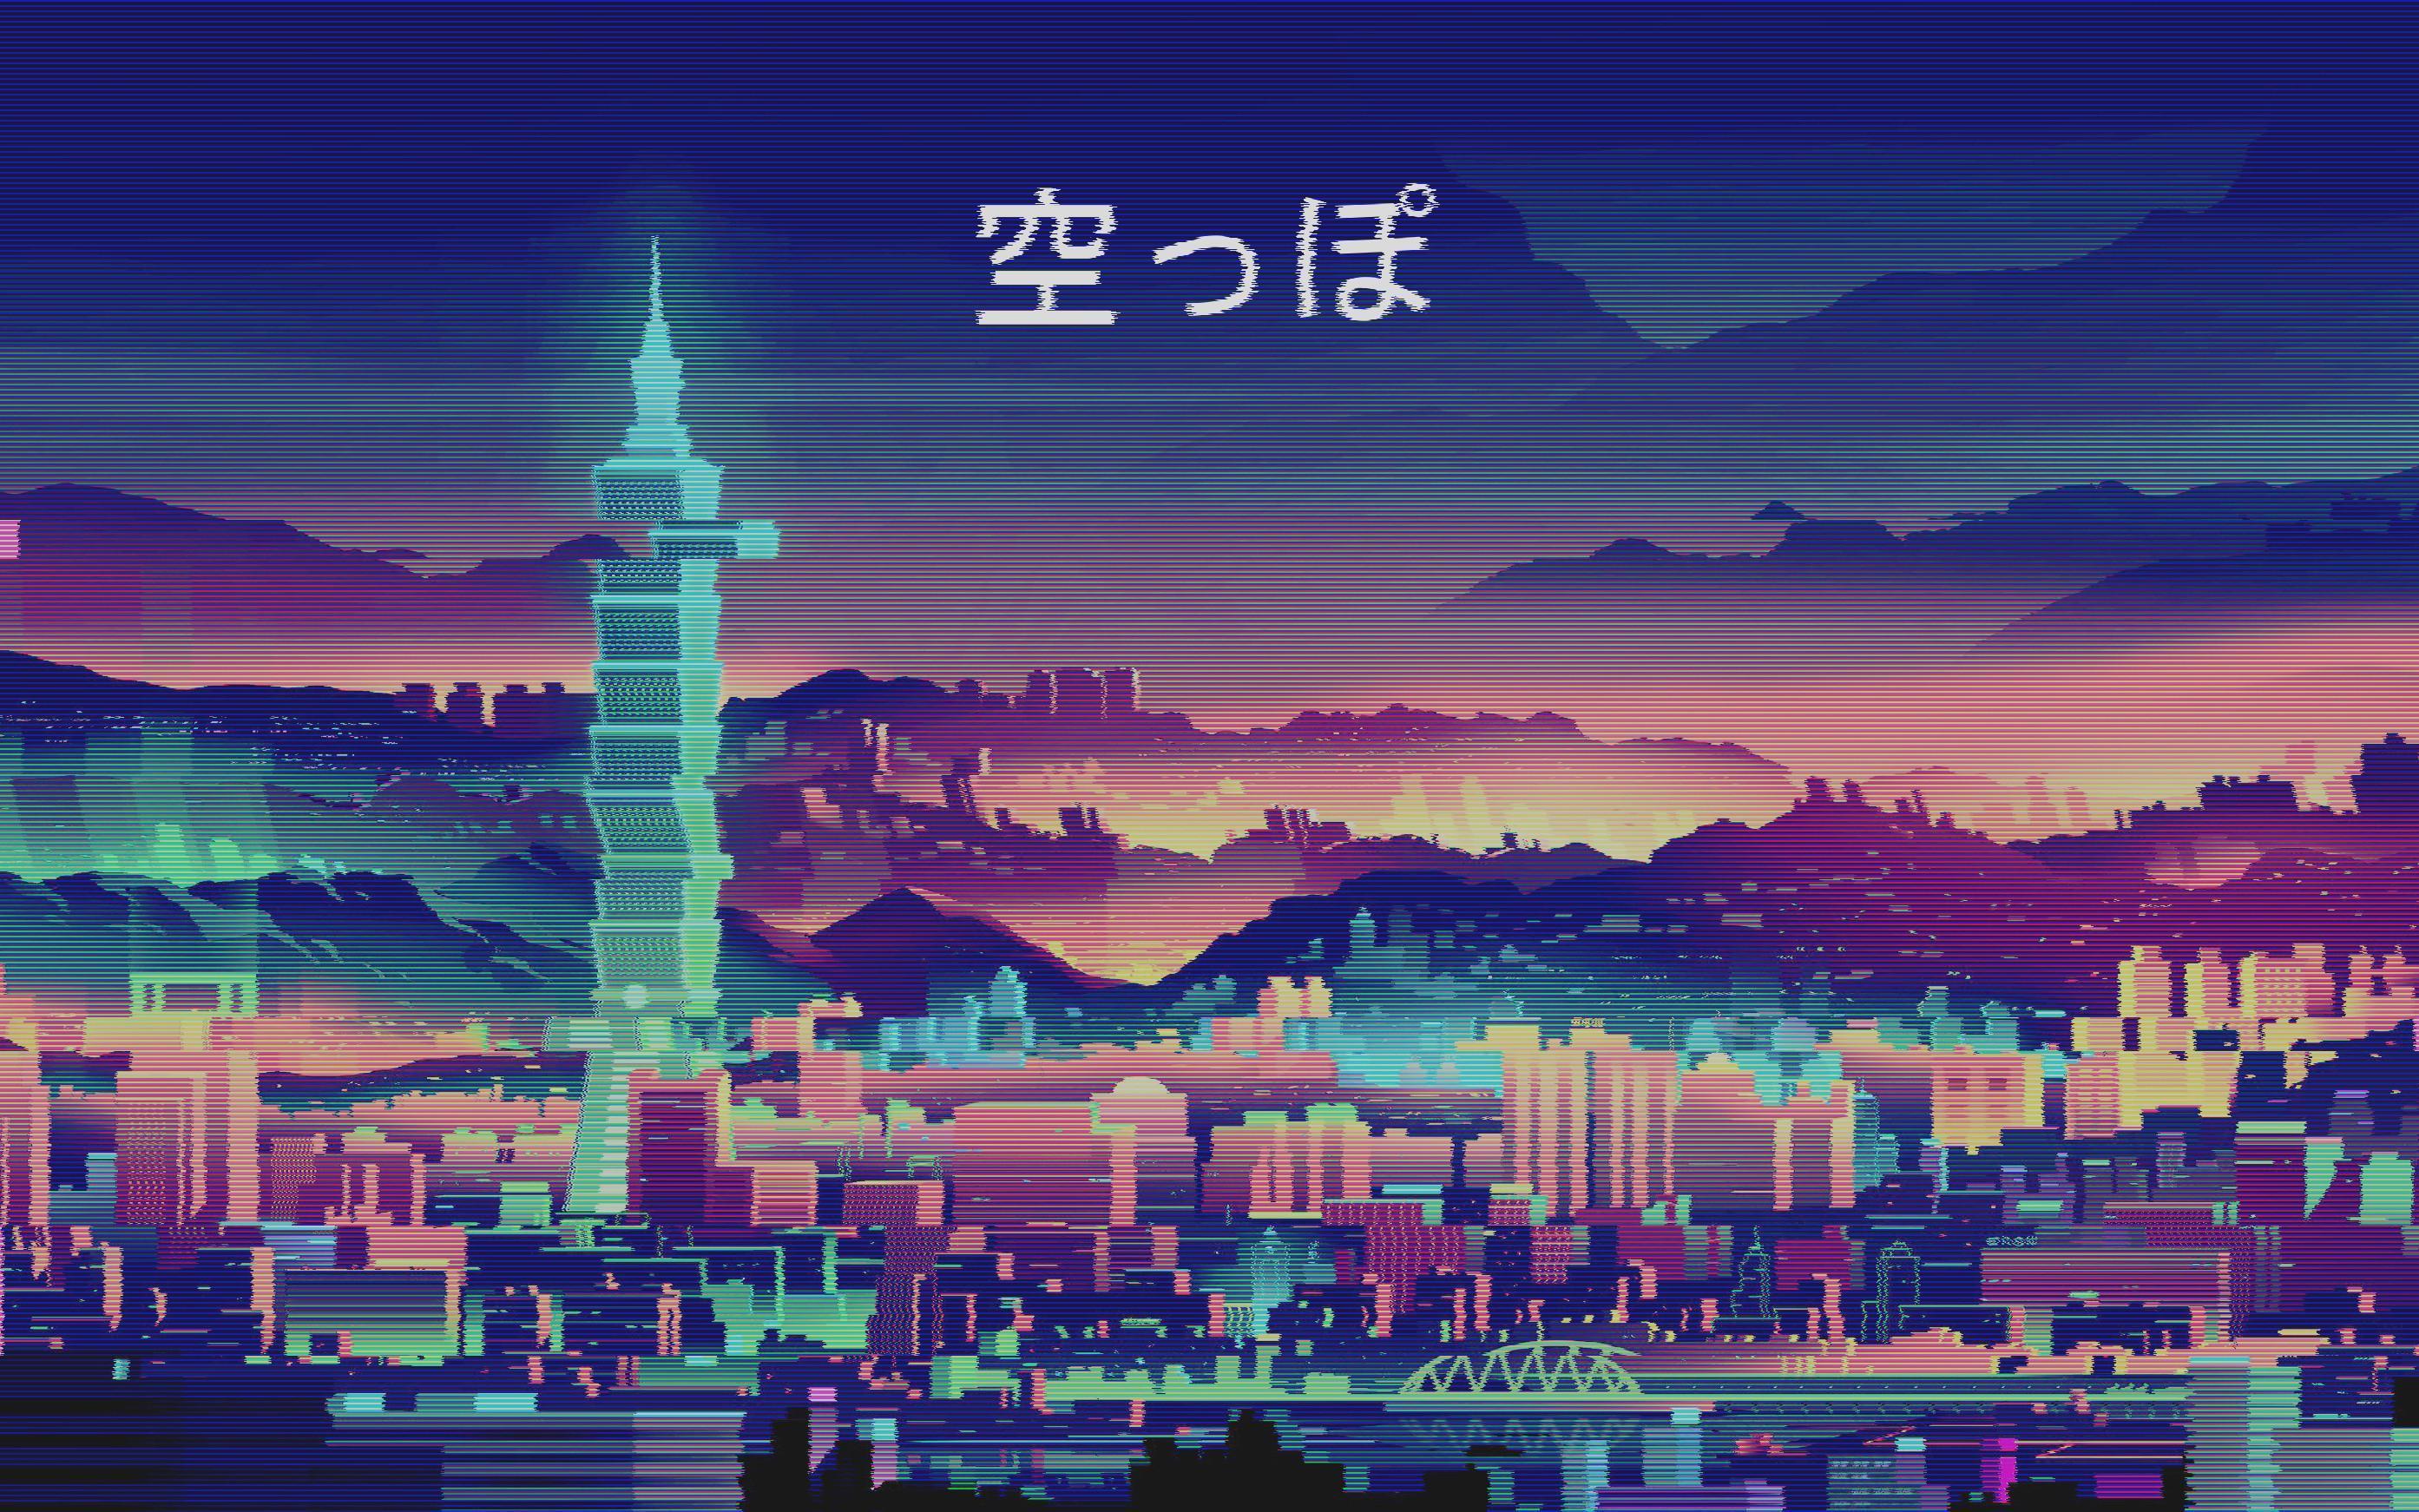 90s Anime Aesthetic Desktop Wallpapers - Wallpaper Cave